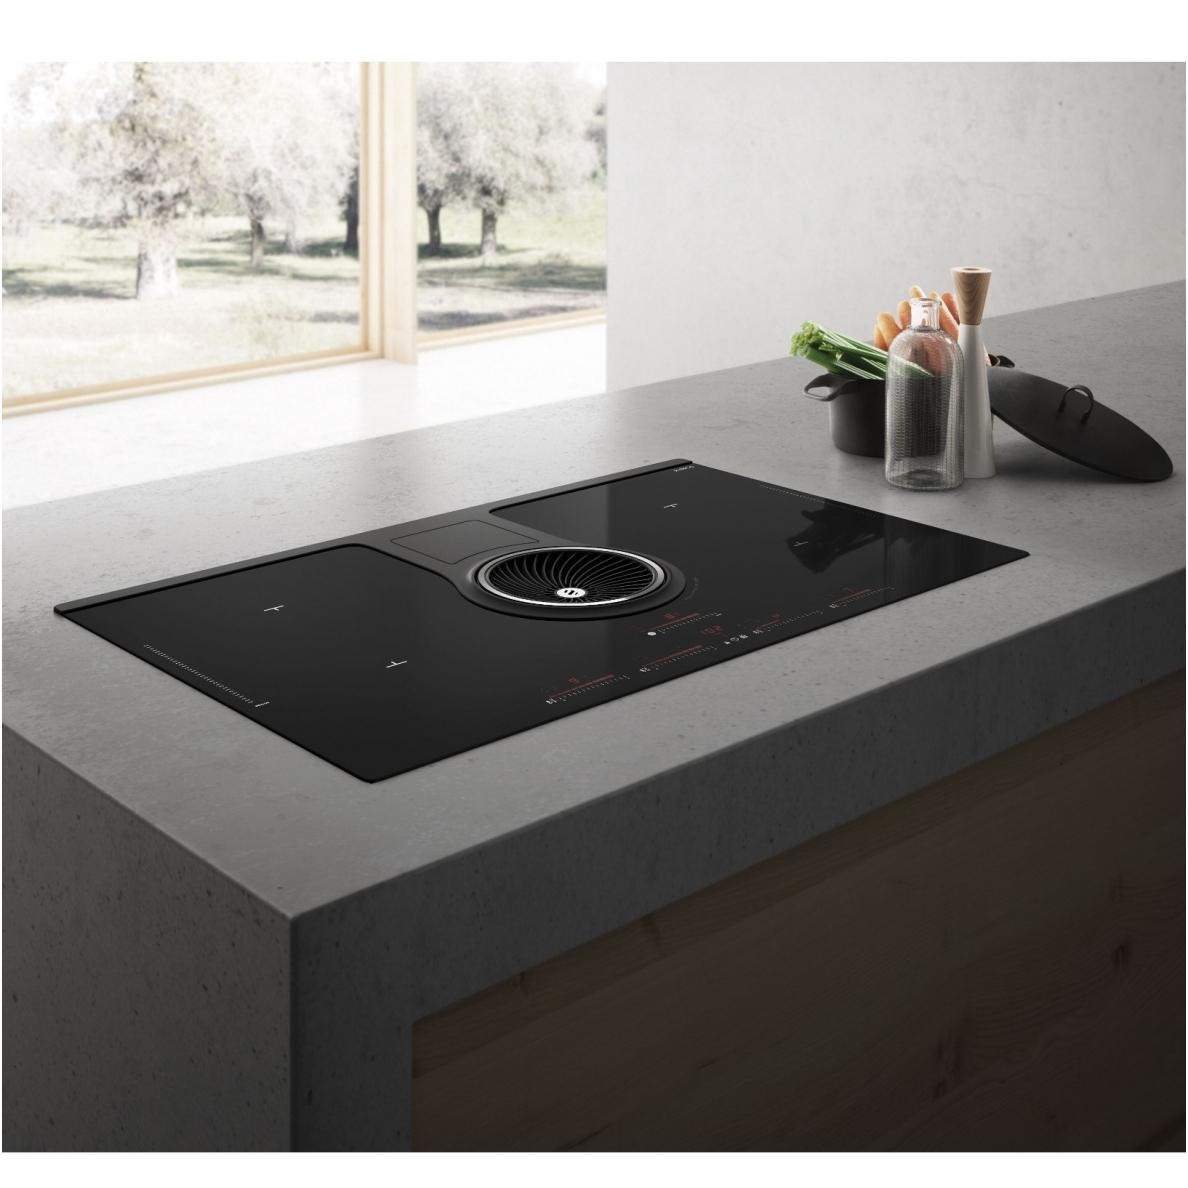 elica nikolatesla bl a 83. Black Bedroom Furniture Sets. Home Design Ideas